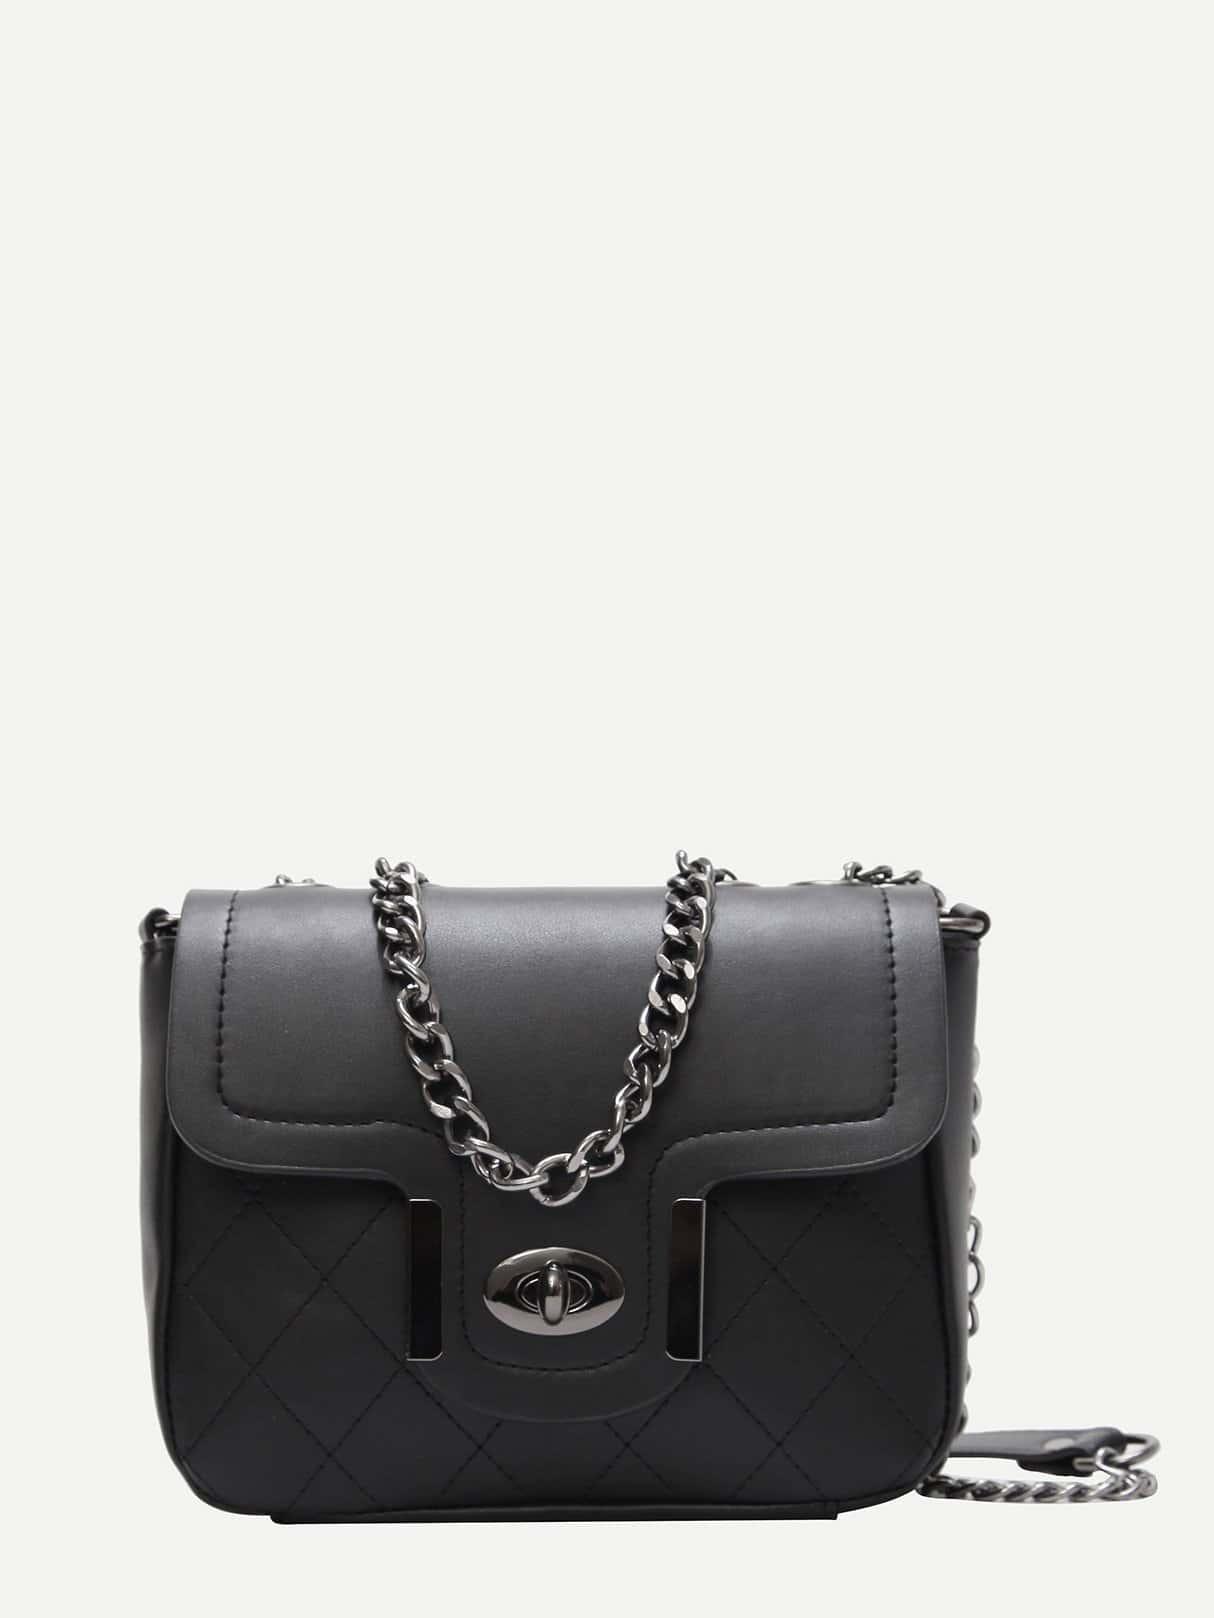 Twist Lock Chain Bag 120cm 47 bronze twist o ring bag chain diy metal purse strap 20pcs freeshipping